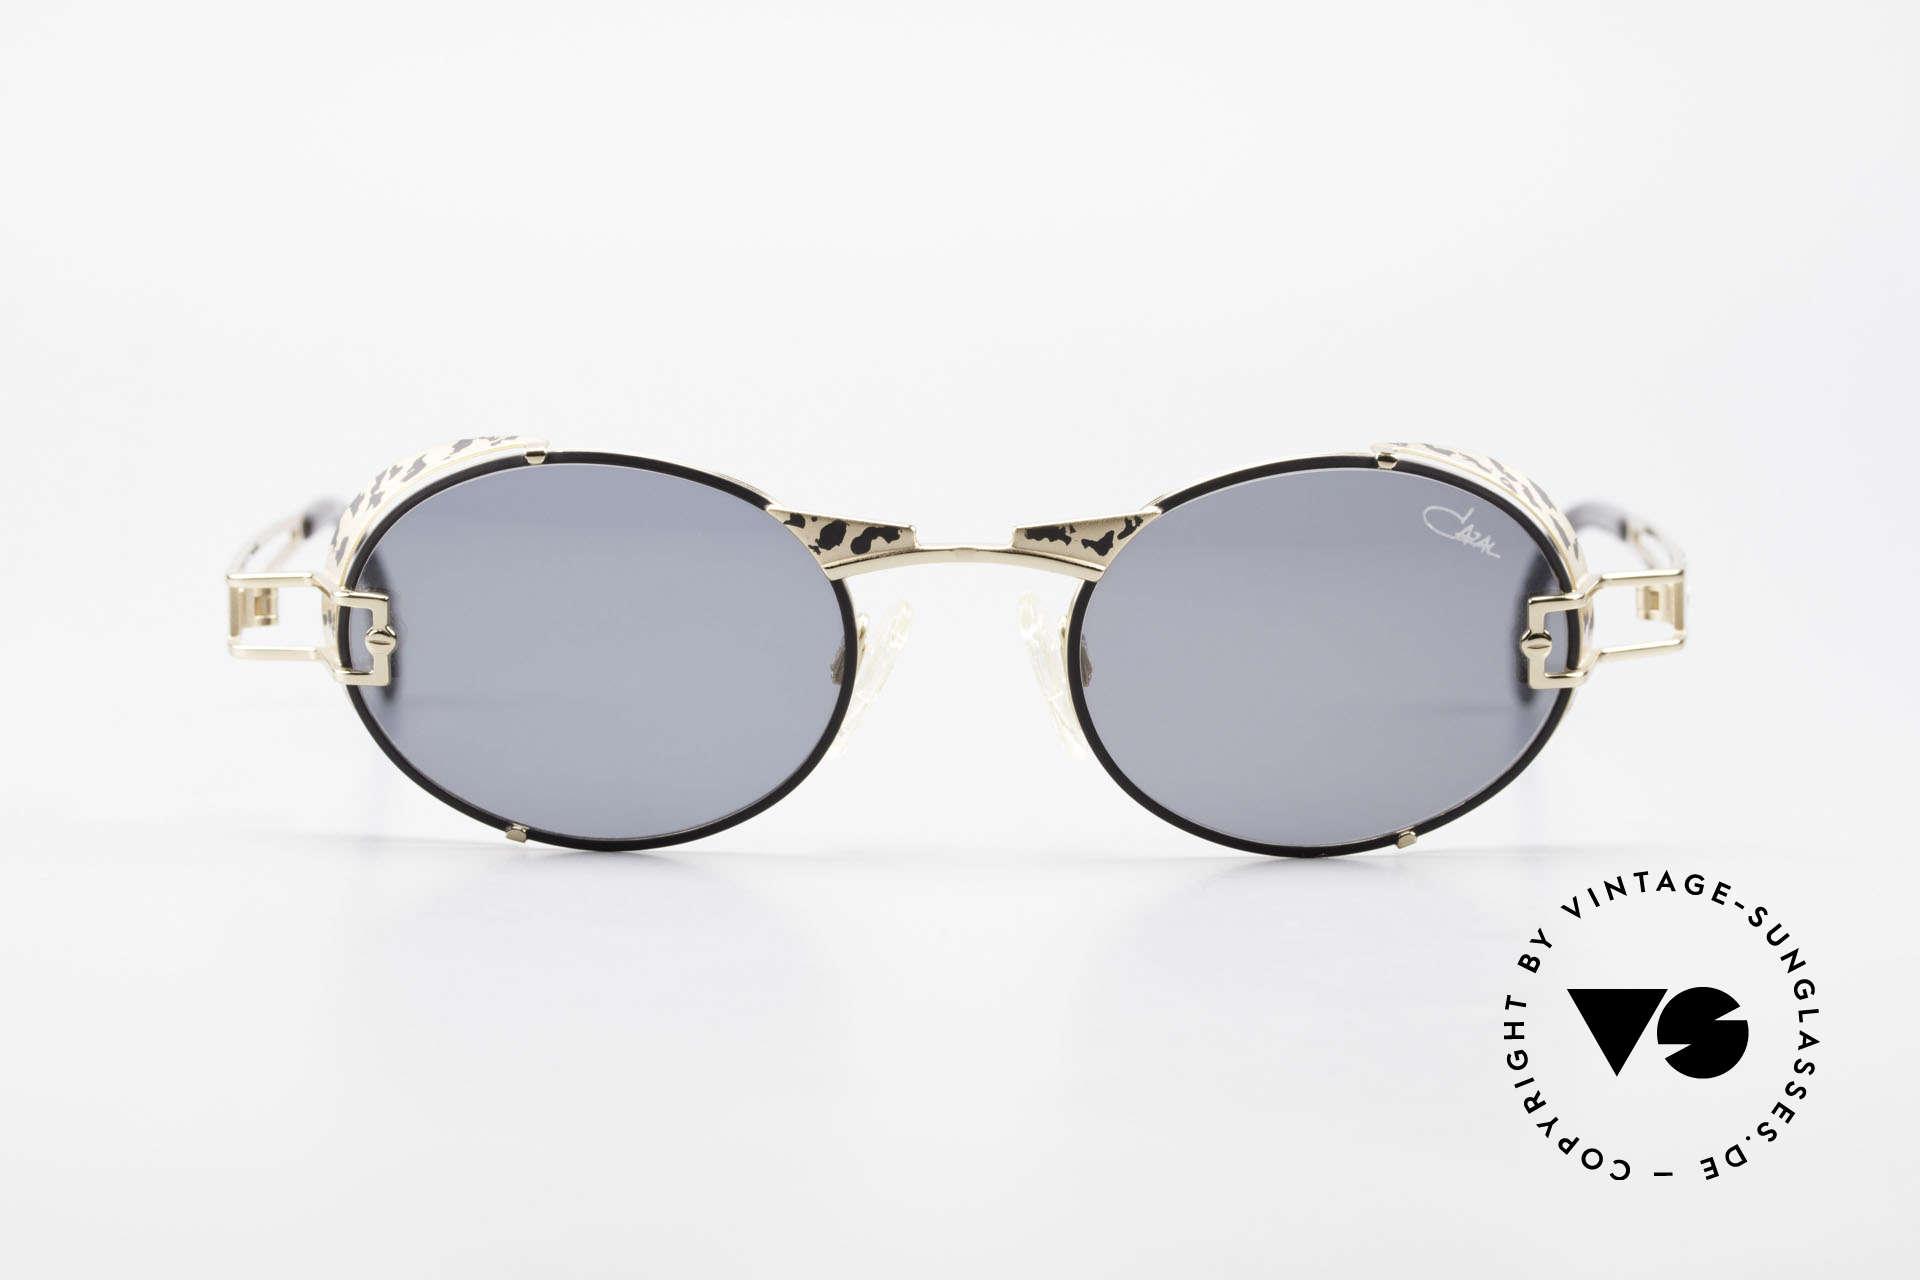 Cazal 991 90's Cazal Steampunk Style, designer sunglasses by CAri ZALloni (CAZAL), Made for Men and Women